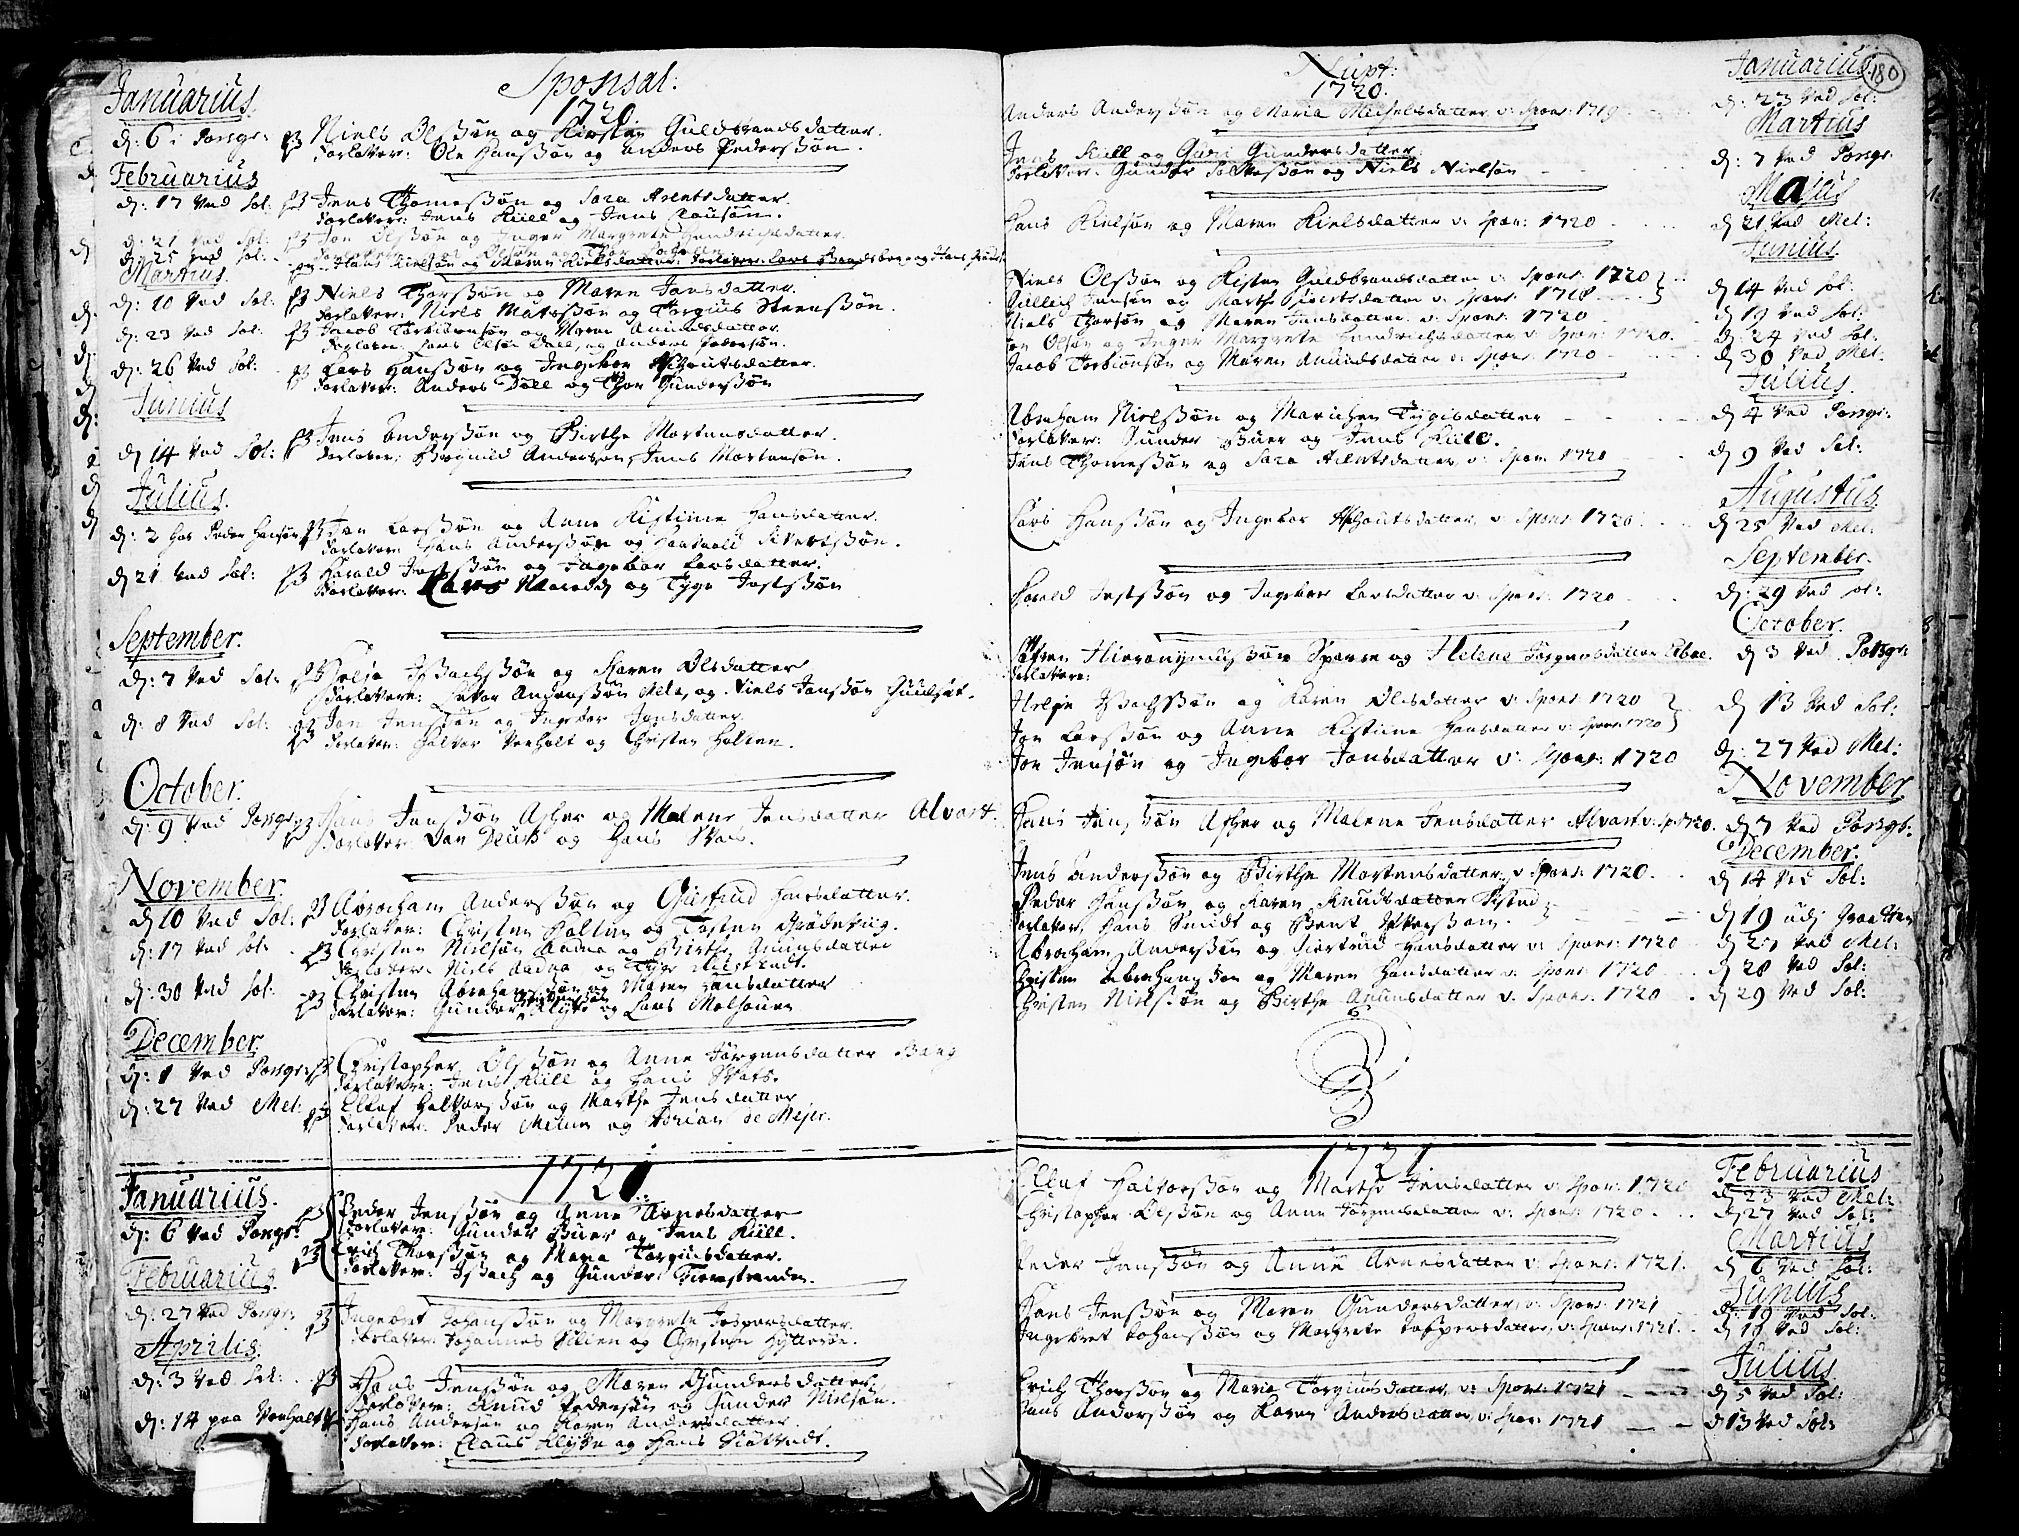 SAKO, Solum kirkebøker, F/Fa/L0002: Ministerialbok nr. I 2, 1713-1761, s. 180